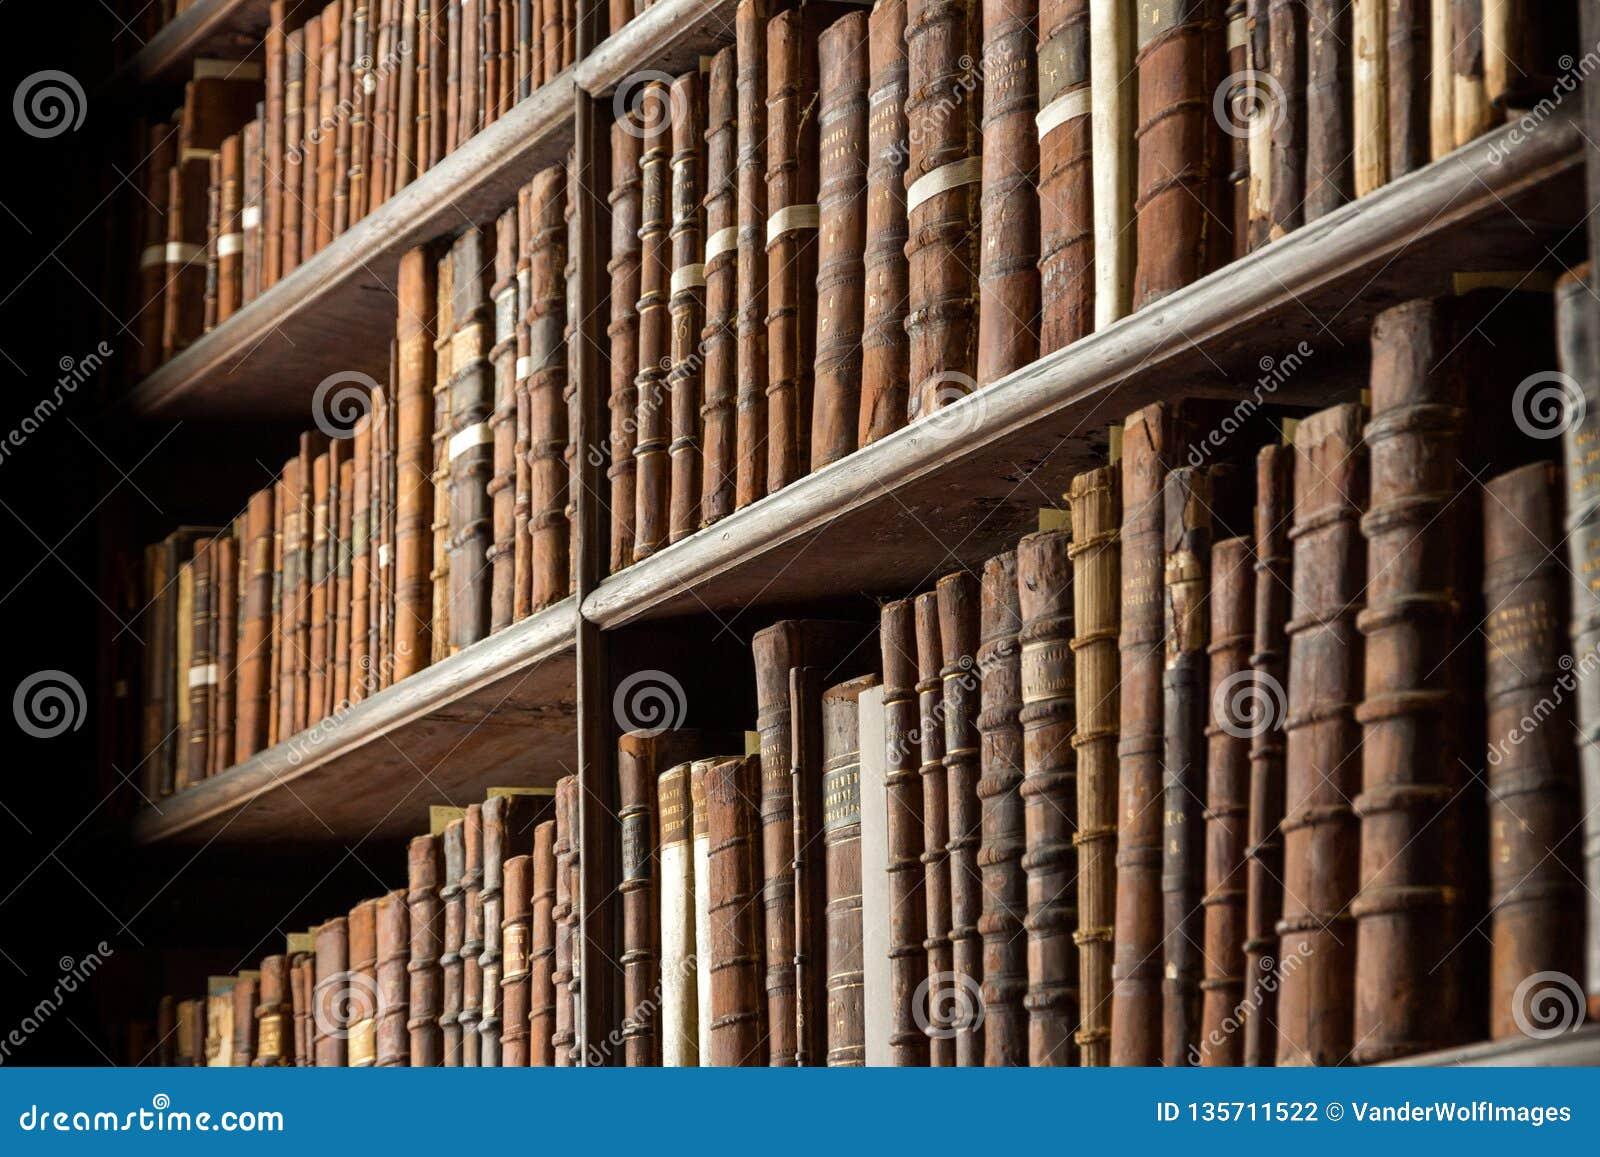 Livres de bibliothèque de cru vieux